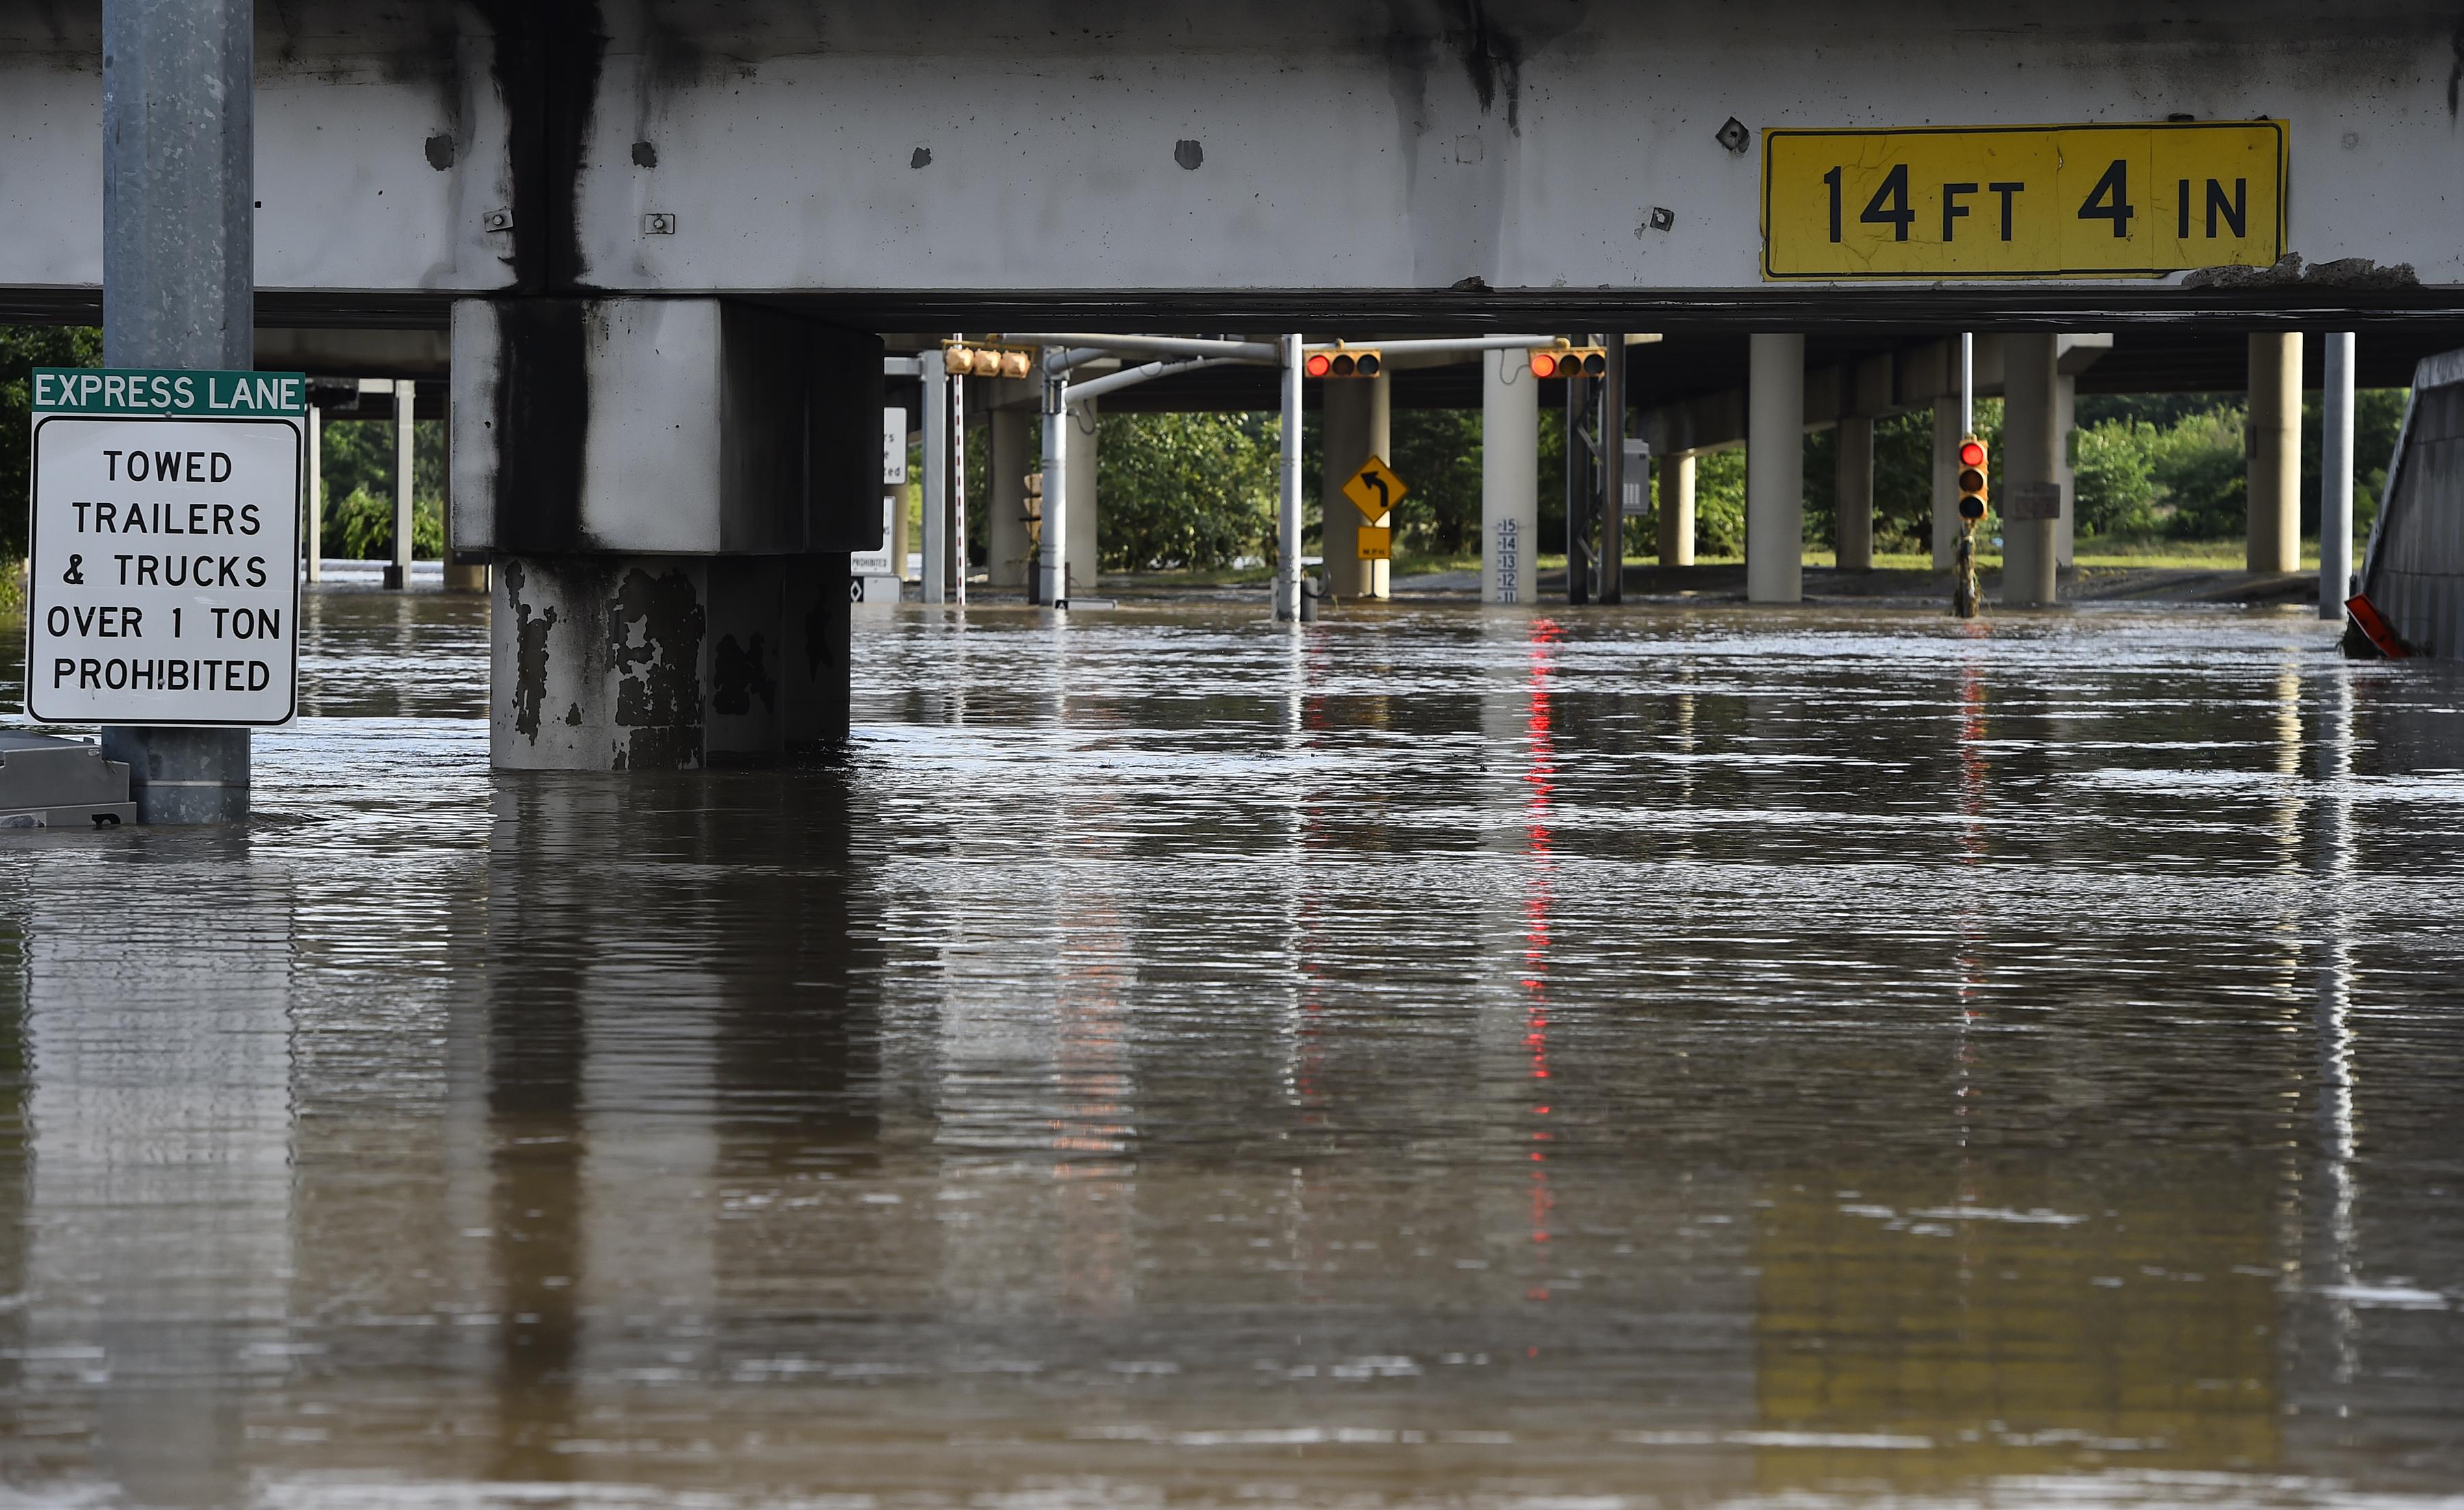 houston flooding - photo #36